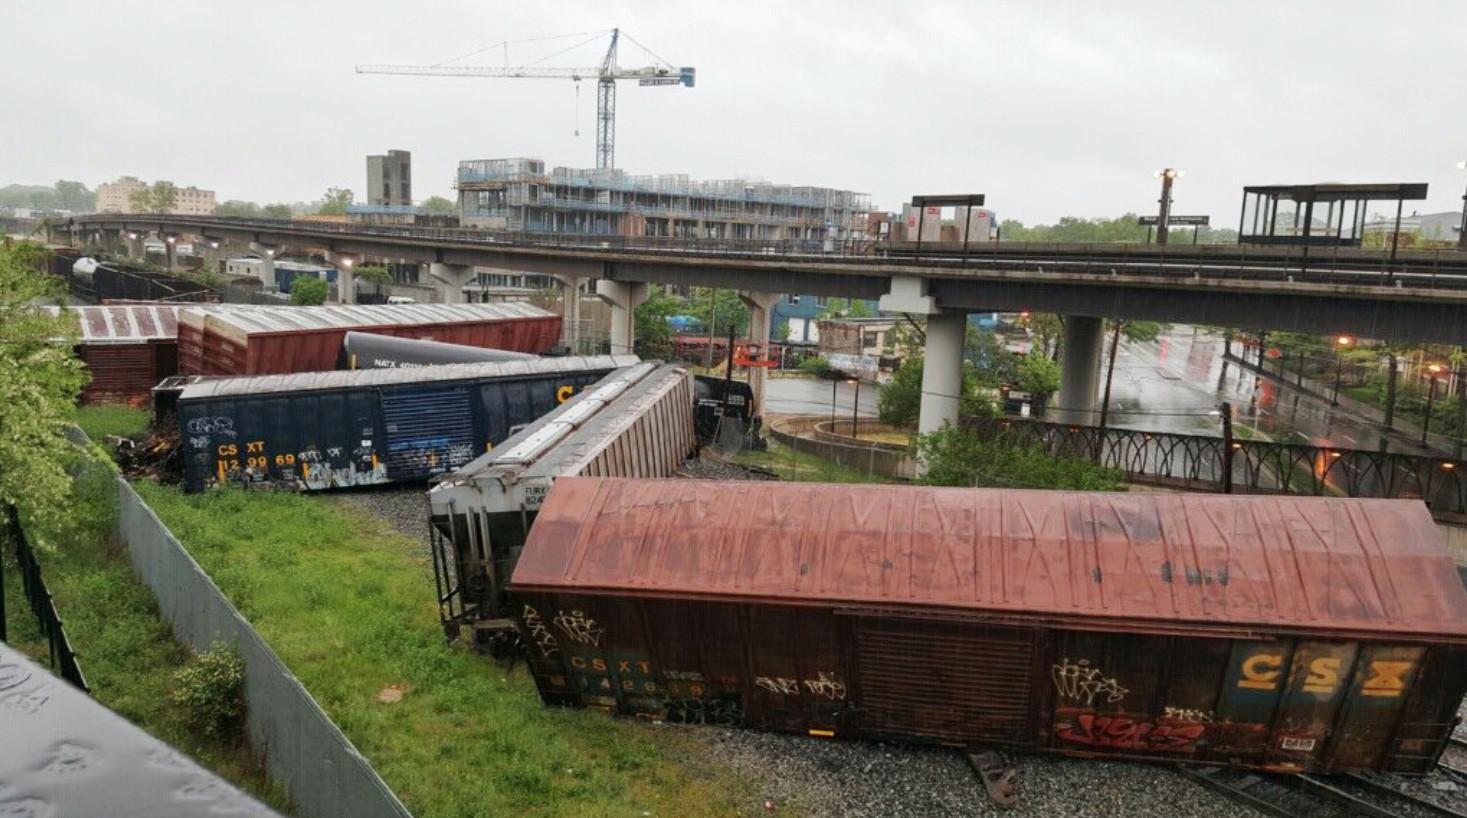 Freight train derails in Washington, D.C., leaks hazardous ...